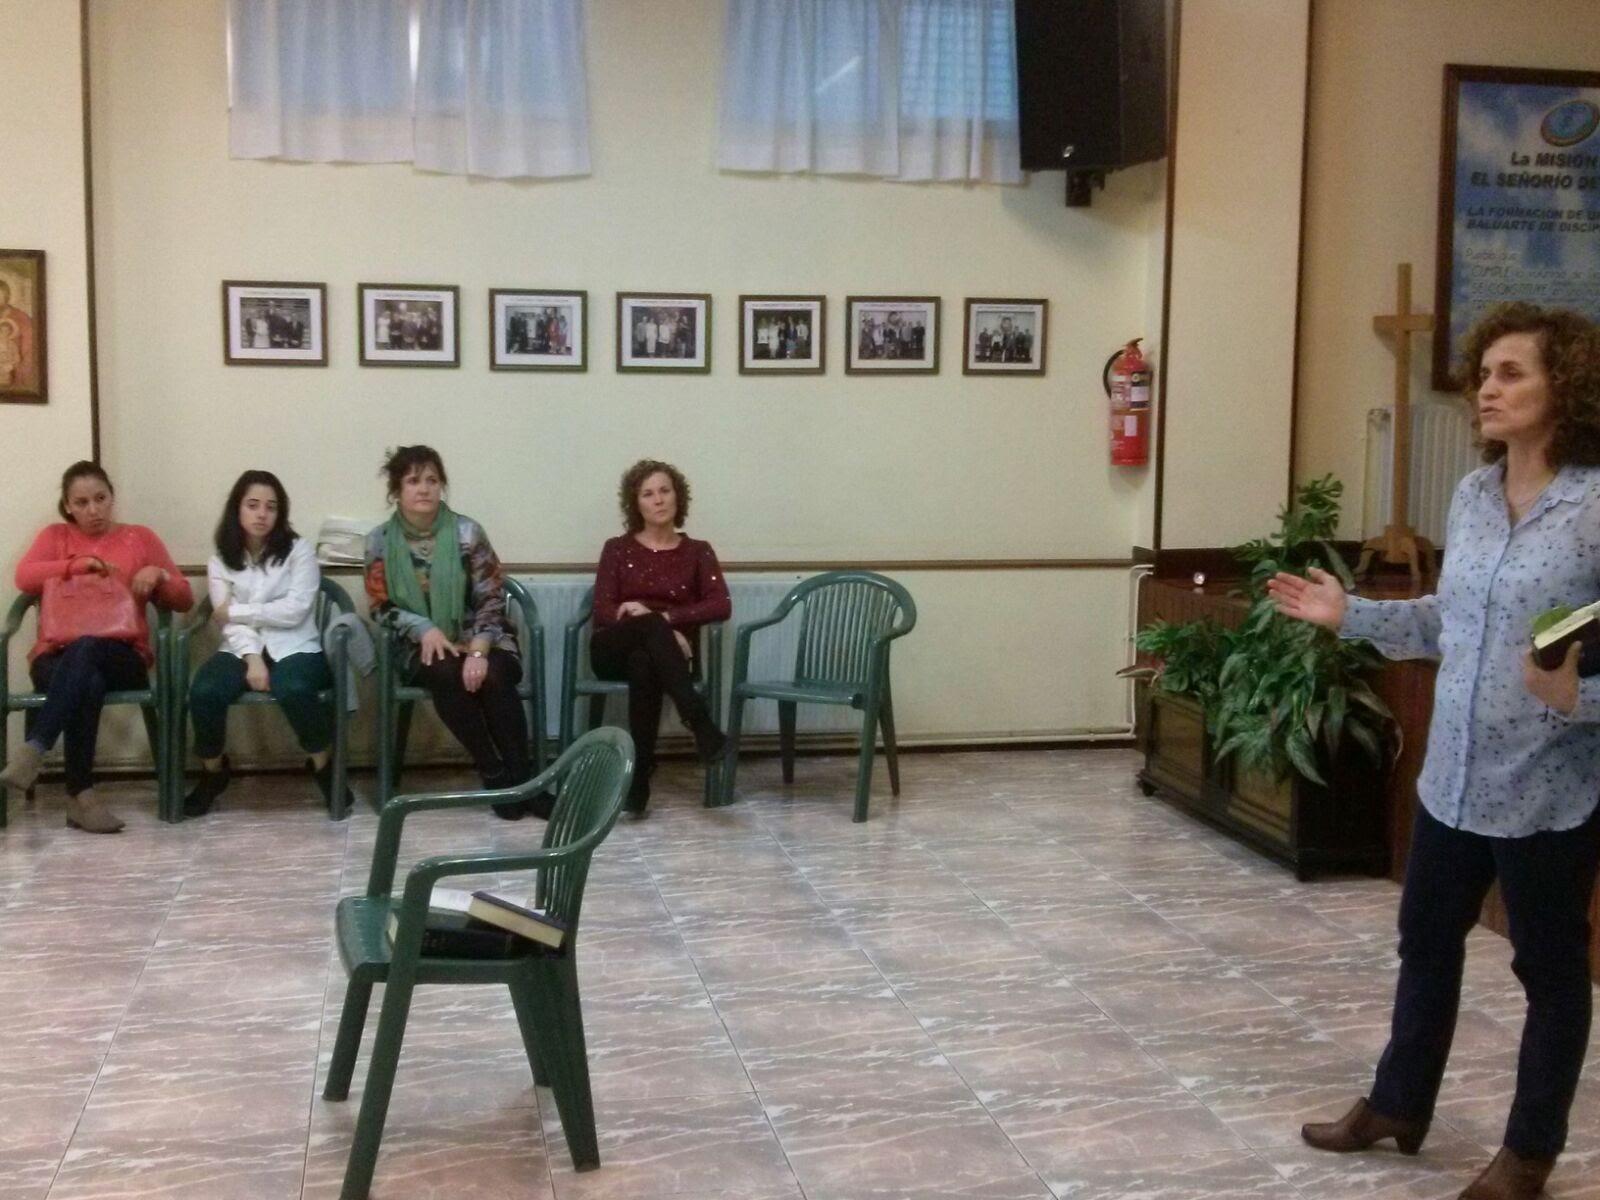 2015.11.14 -Actividad Evangelística de Hermanas (2).jpg